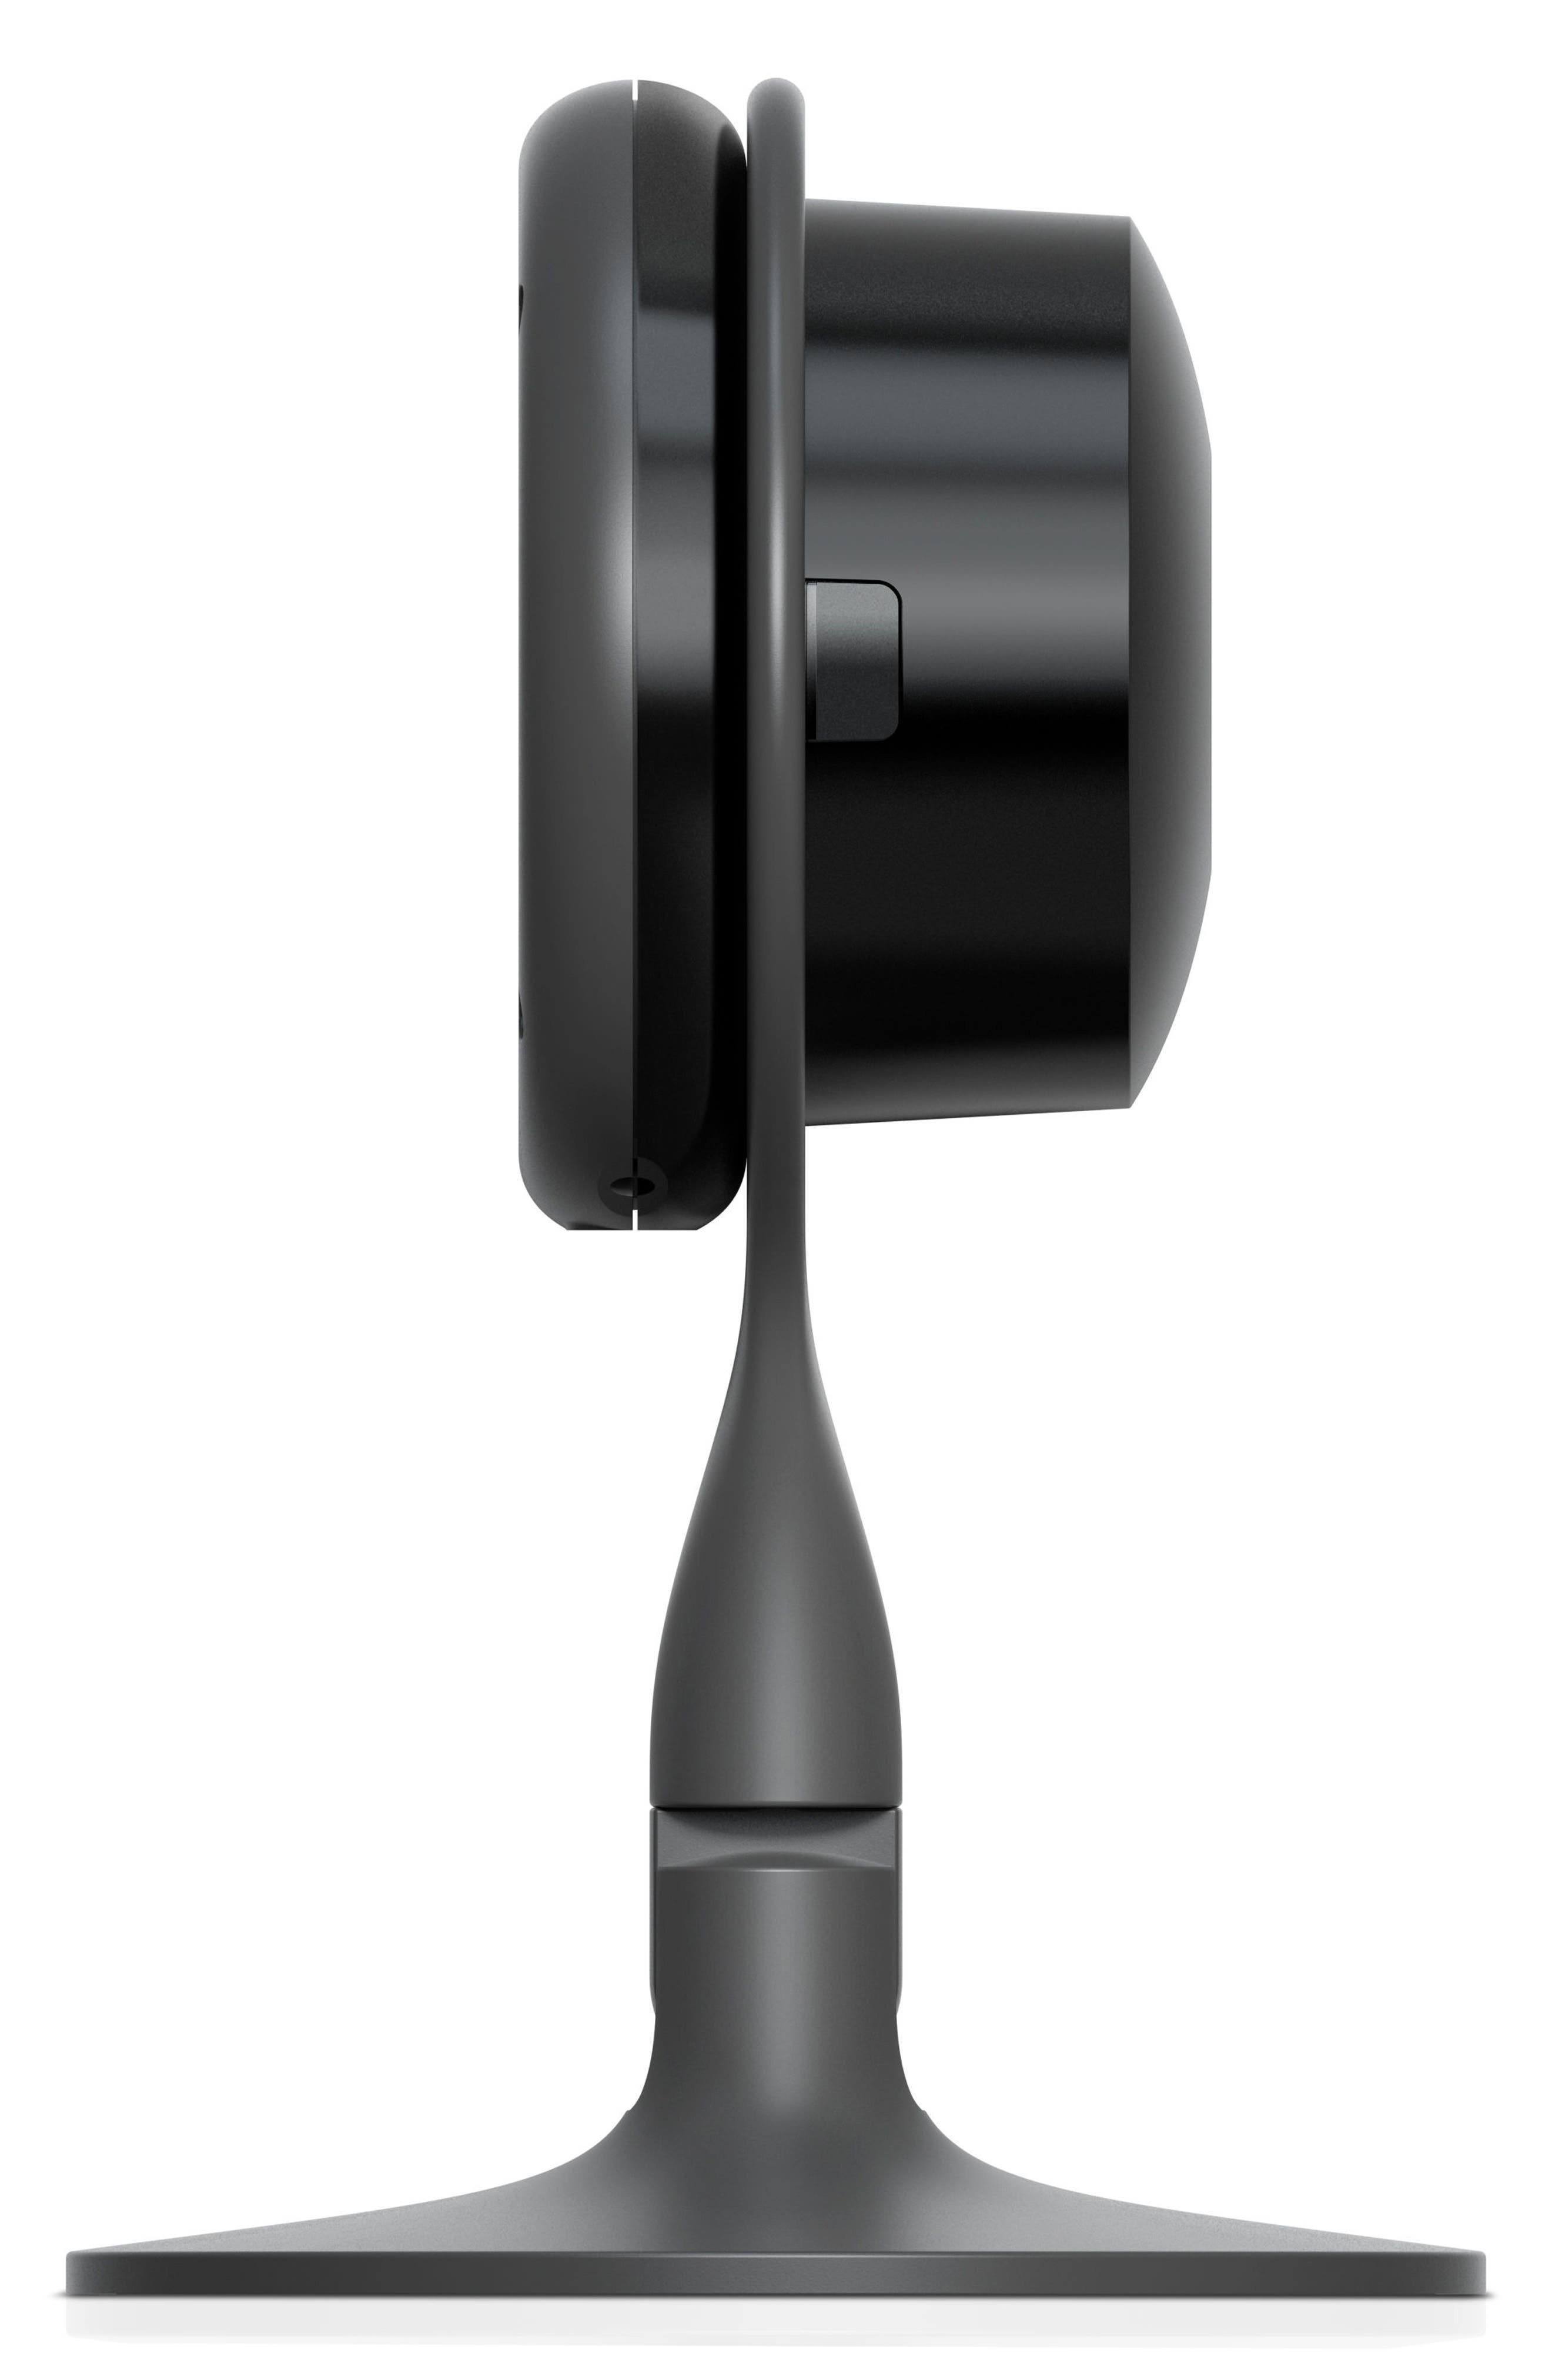 Cam Indoor Security Camera,                             Alternate thumbnail 6, color,                             Black